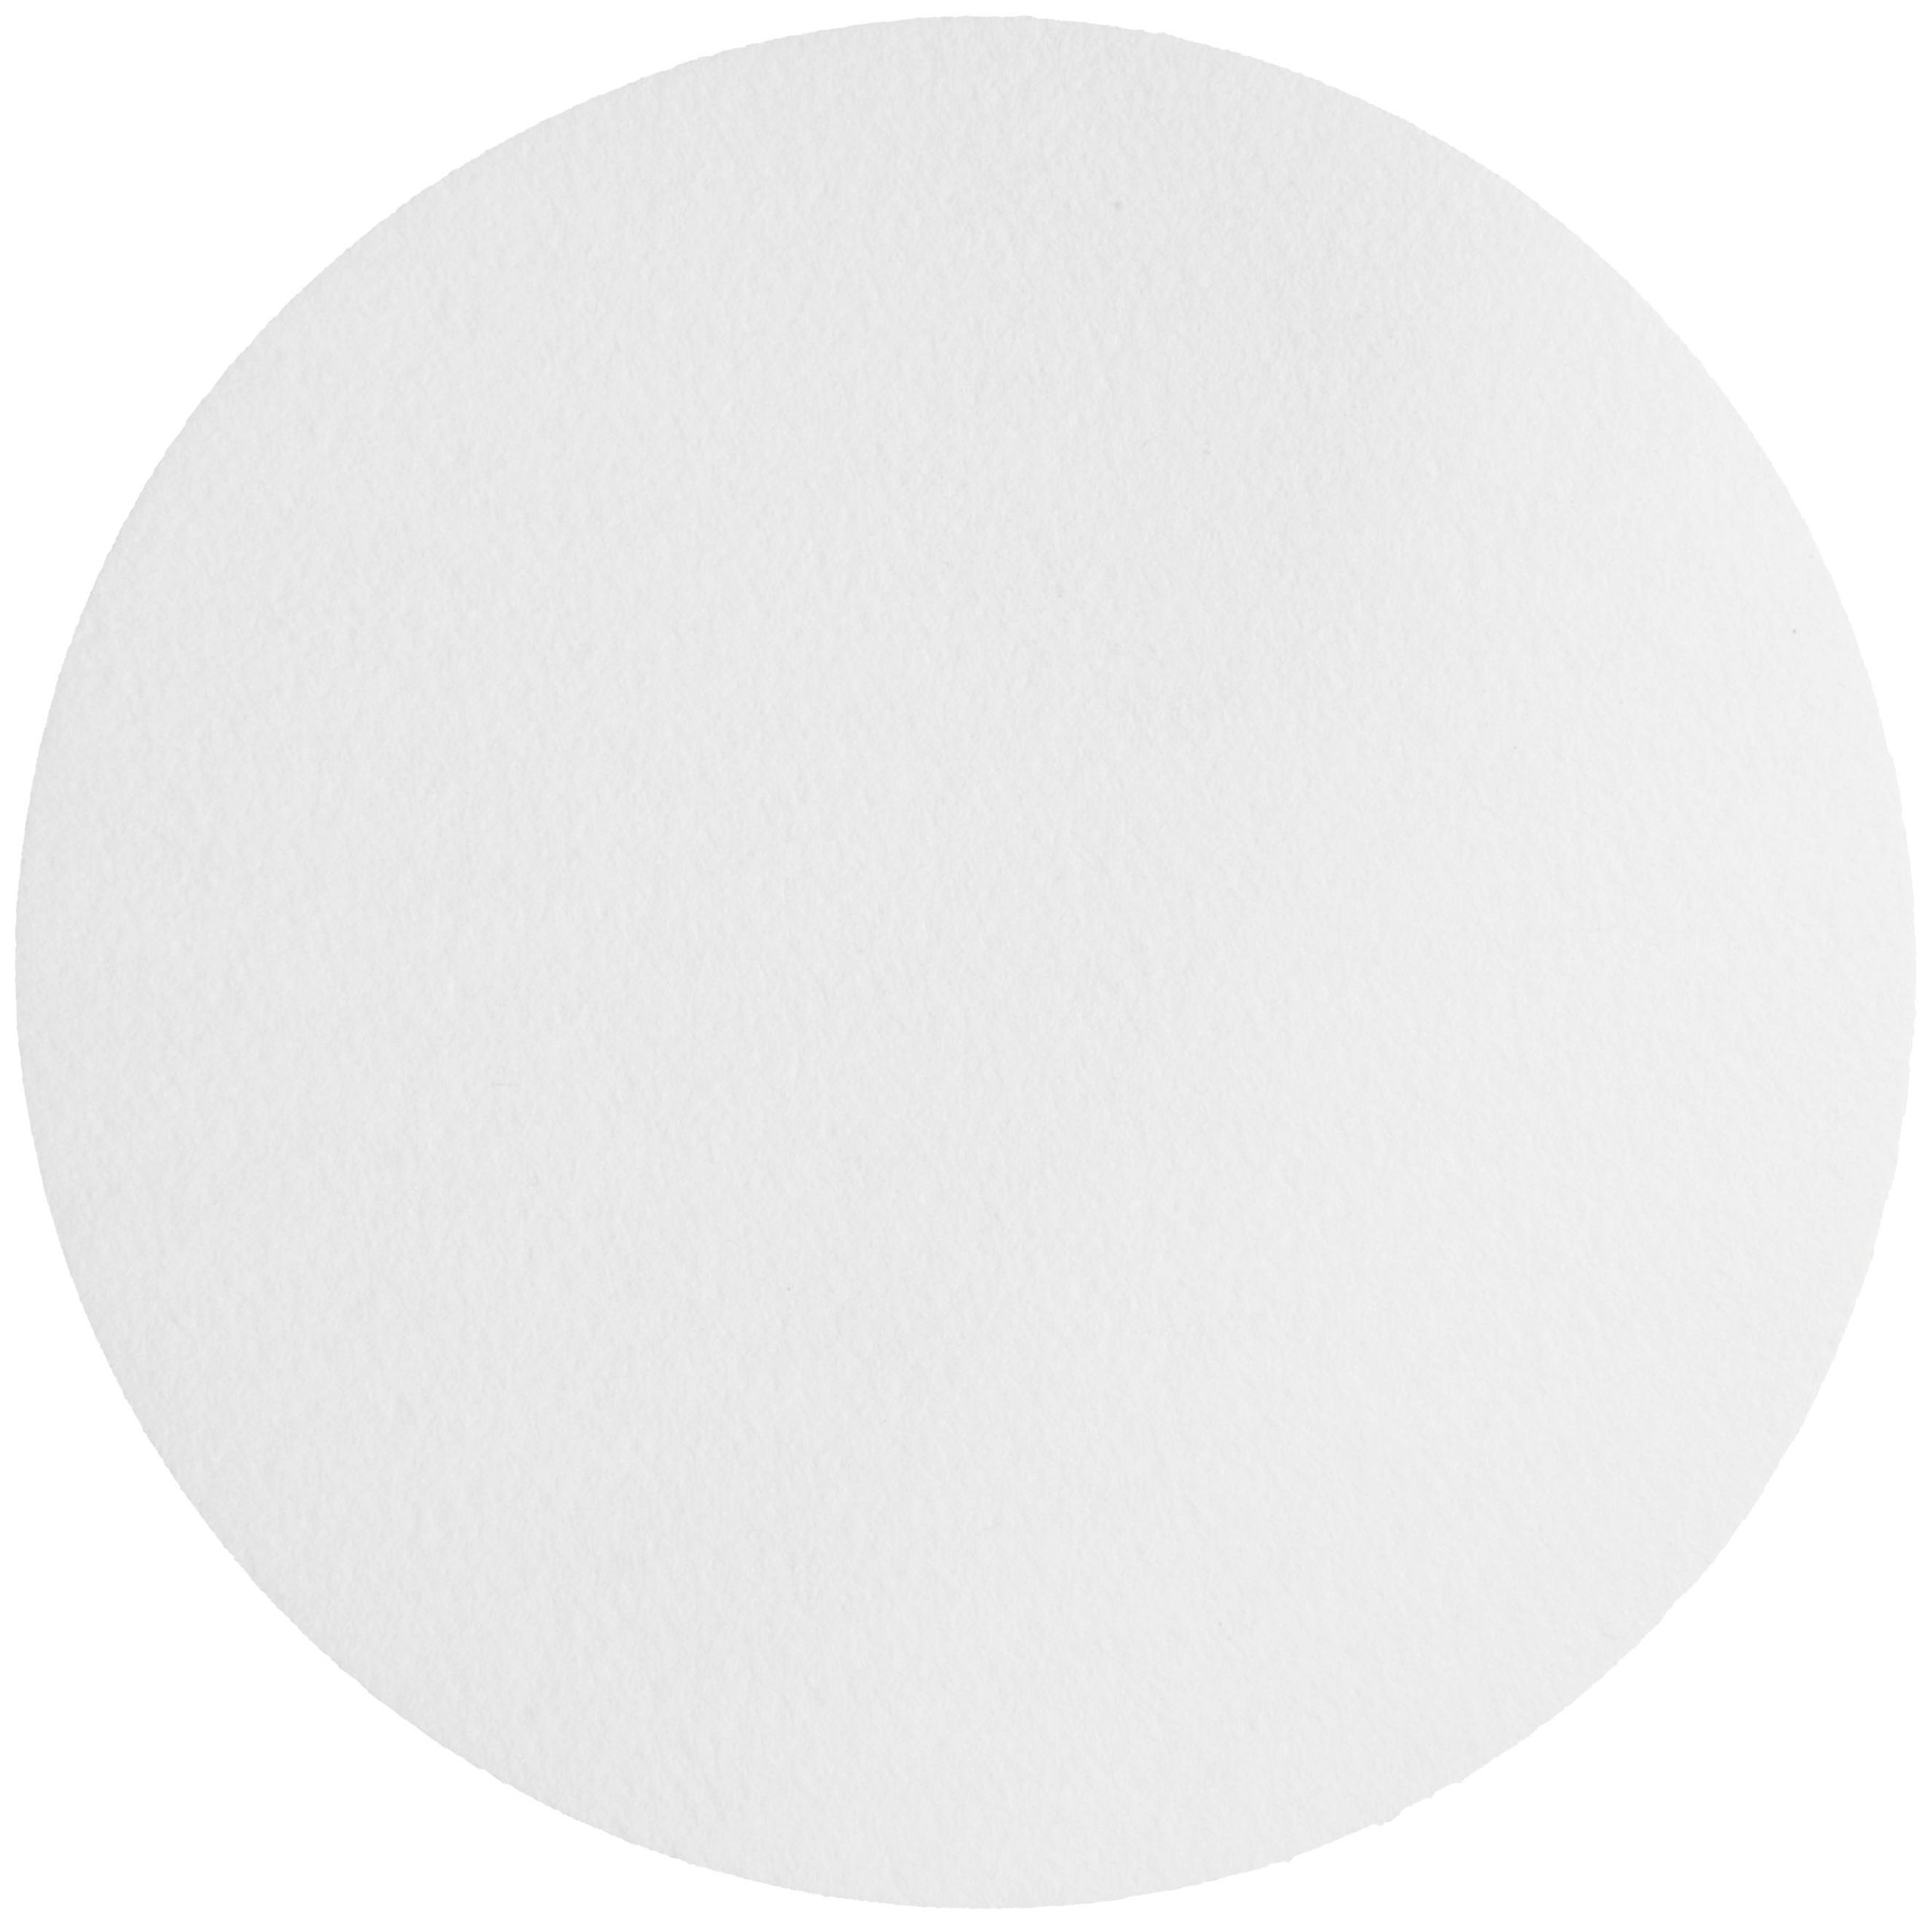 Whatman 1005-185 Quantitative Filter Paper Circles, 2.5 Micron, 94 s/100mL/sq inch Flow Rate, Grade 5, 185mm Diameter (Pack of 100) by Whatman